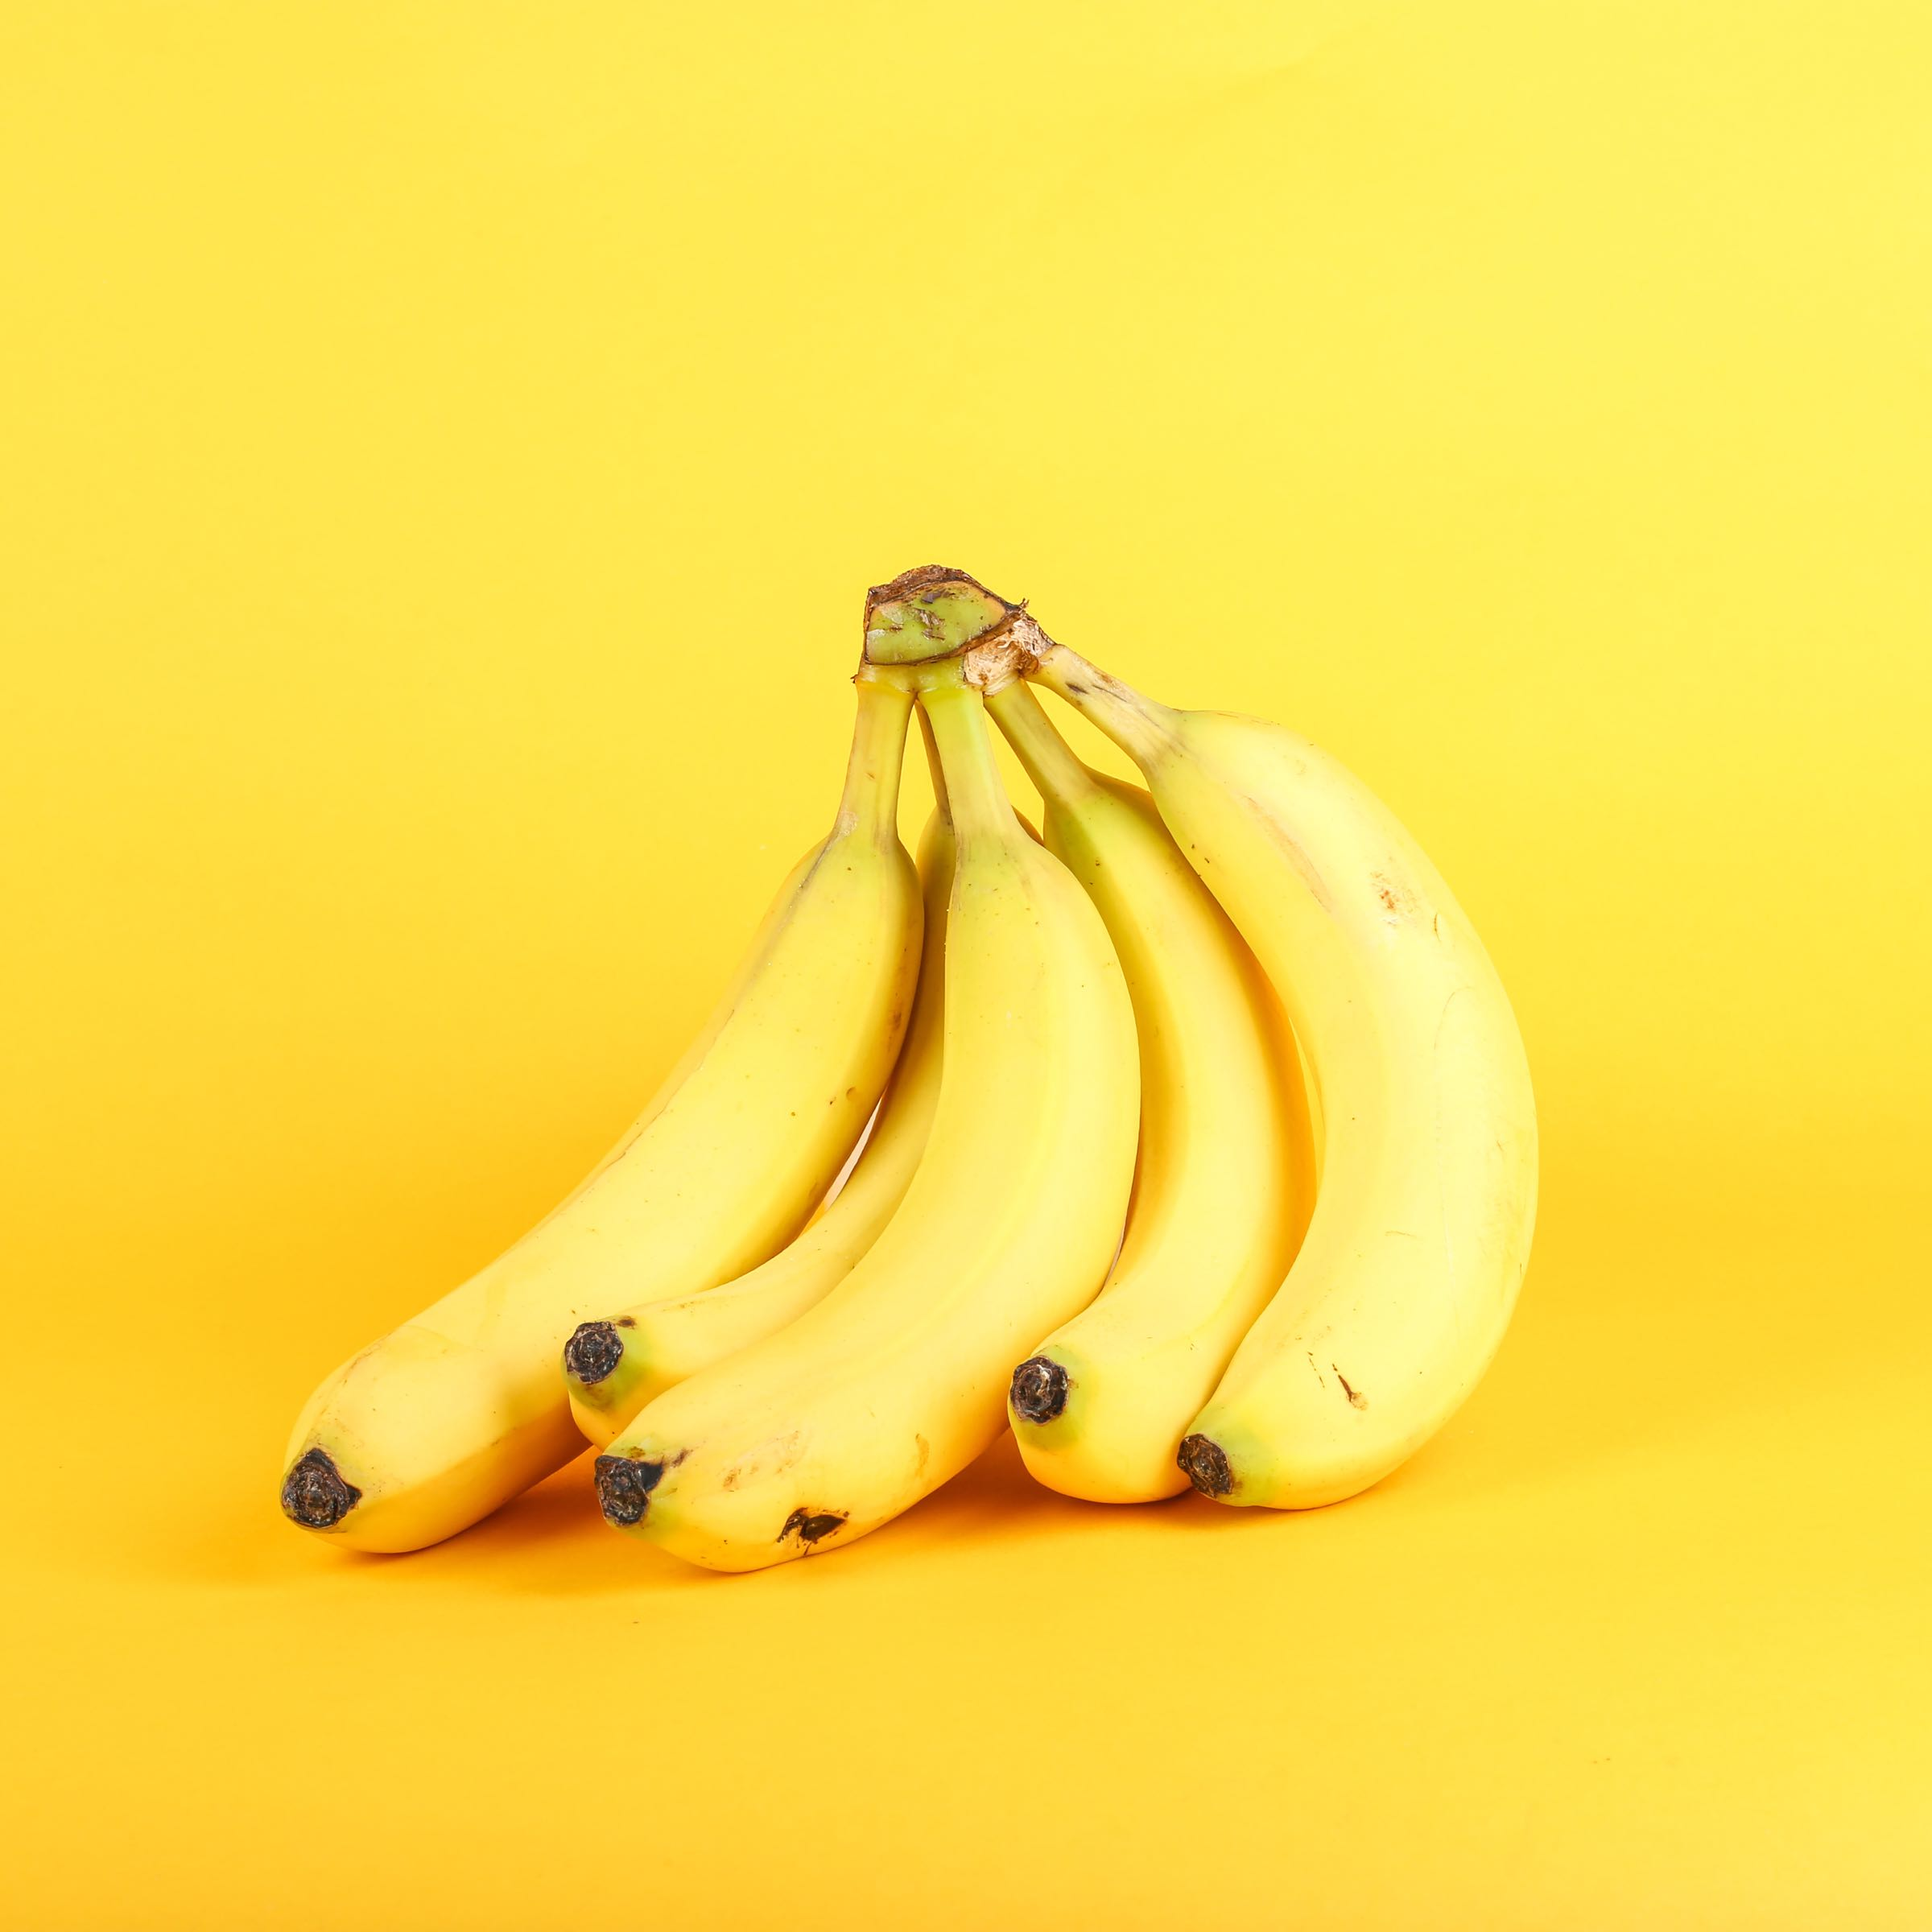 1 kg bananas